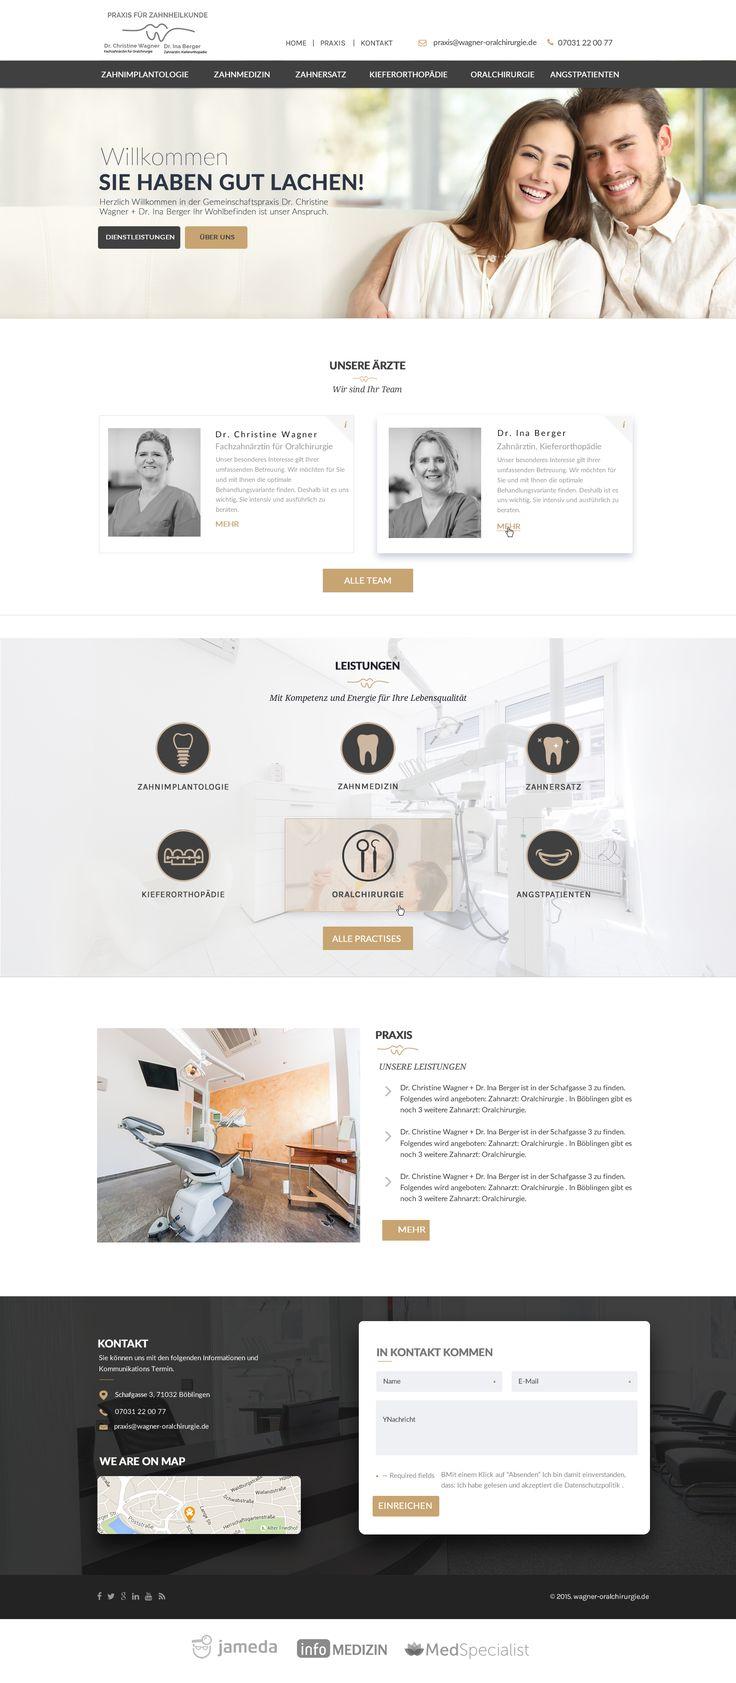 Dental Office Website Design | Home Design Ideas